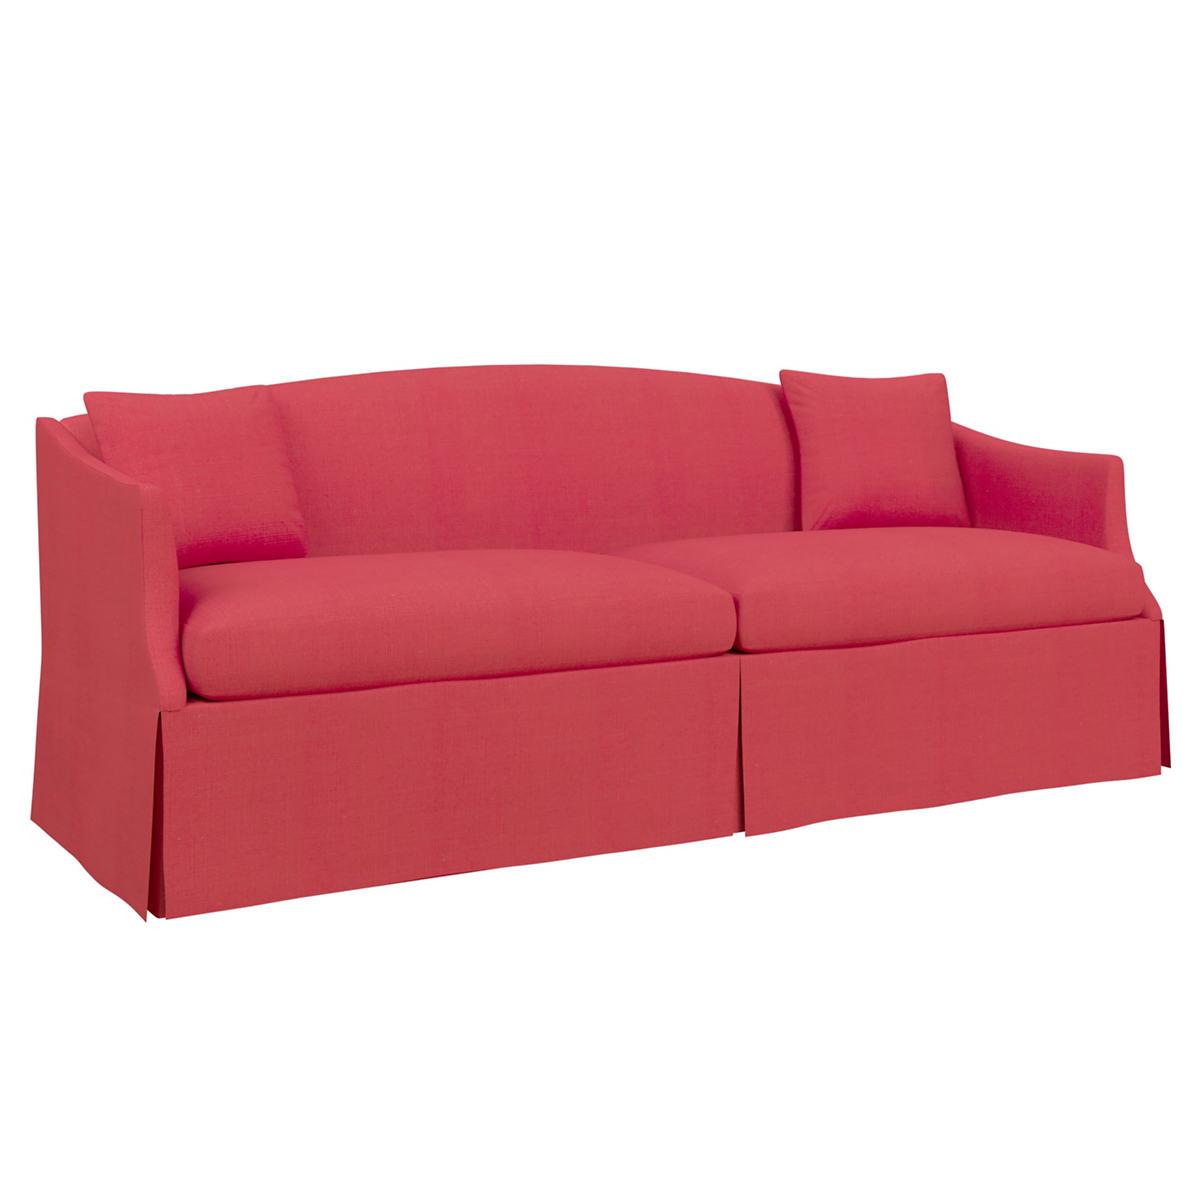 Estate Linen Azalea Avignon Sofa